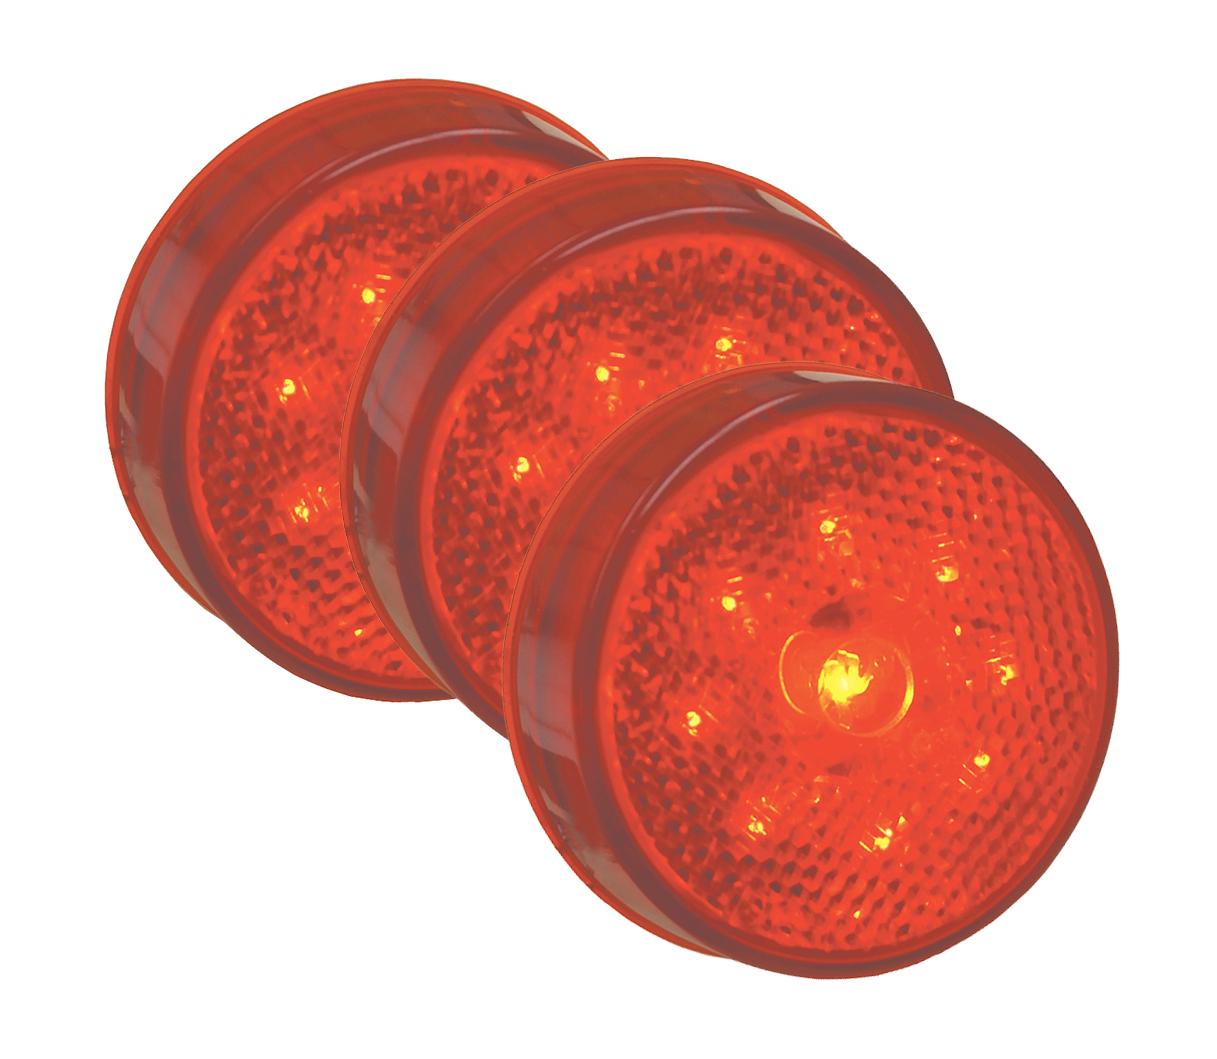 G1002-3 – Hi Count® 2 1/2″ LED Clearance Marker Light, Built-In Reflector, Red, Bulk Pack